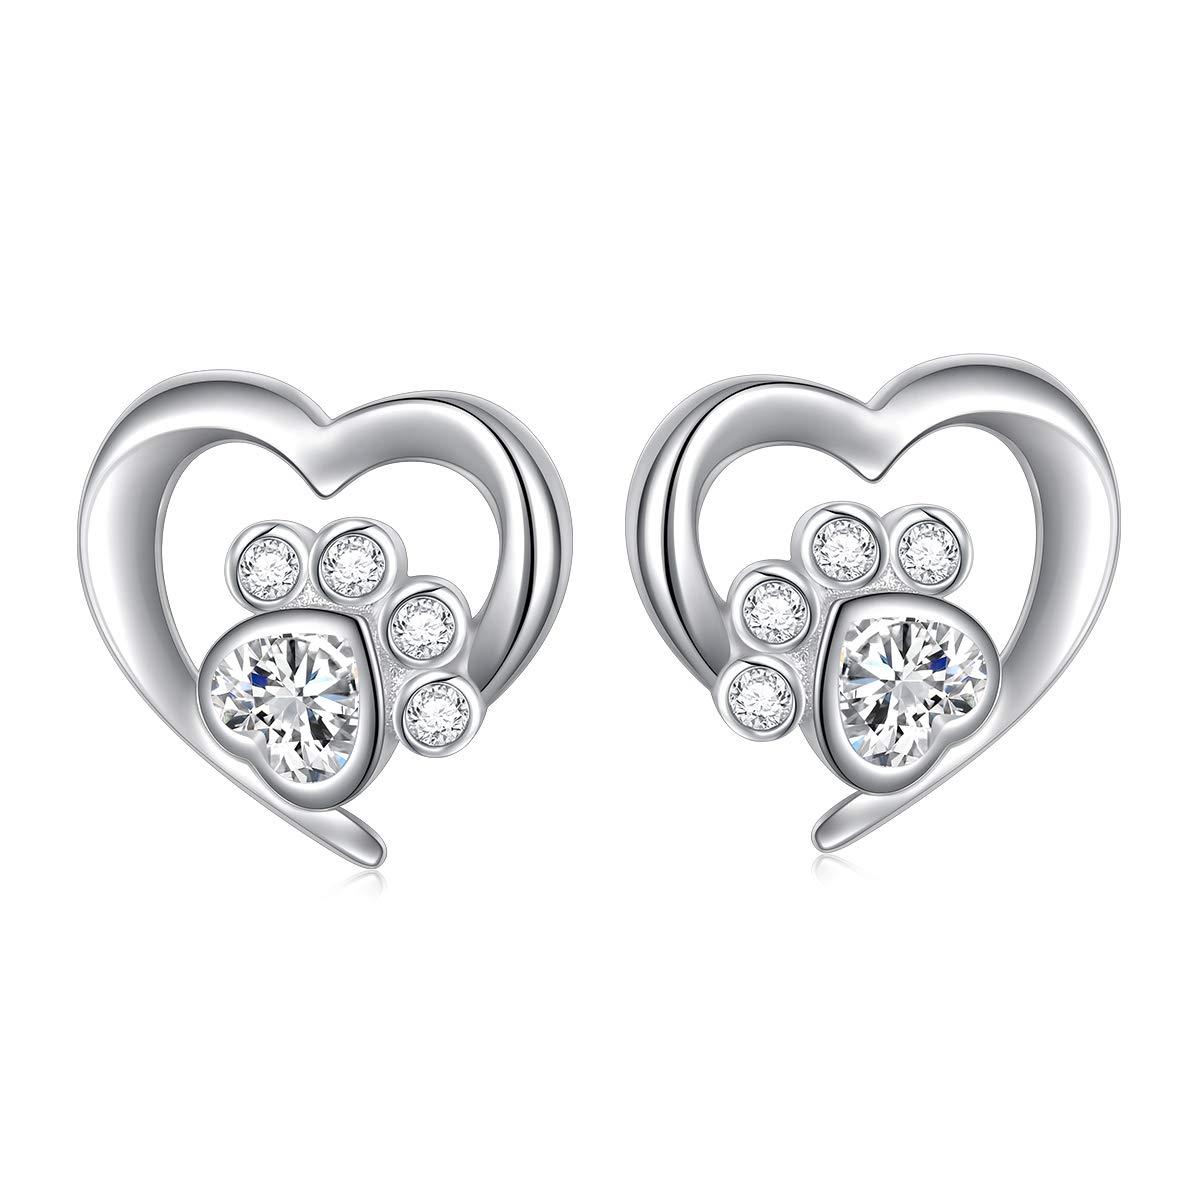 ad312502b 925 Sterling Silver Cute Paw Print Forever Love Heart Pendant Necklace/Stud  Earrings/Bracelet